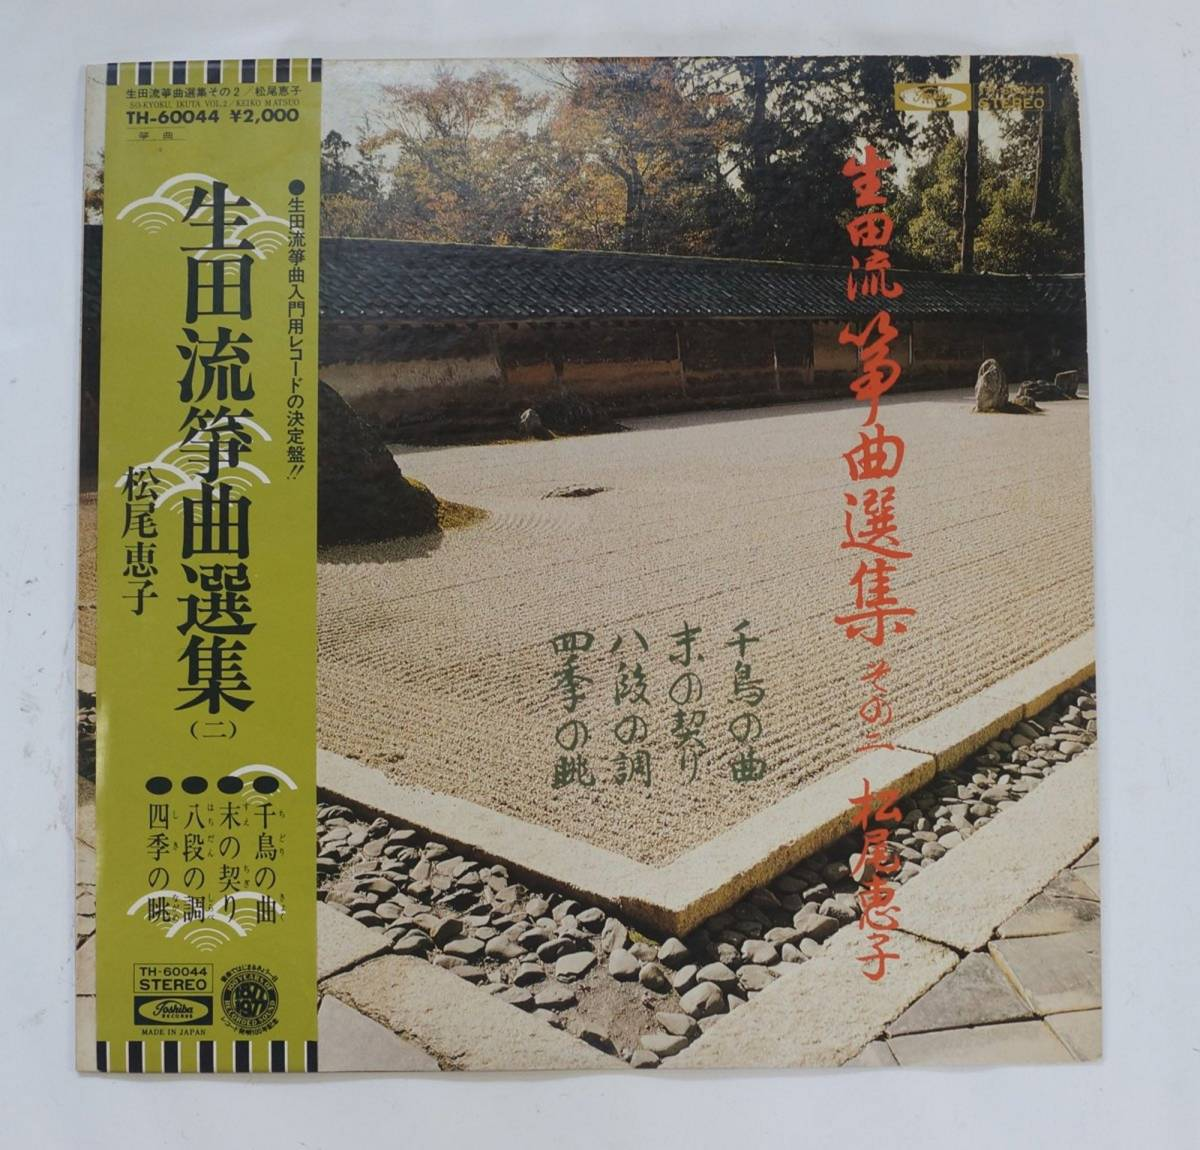 レコード LP 生田流箏曲選集 2 松尾恵子(箏)( TH-60044 Toshiba Rec. JPN 1978 )